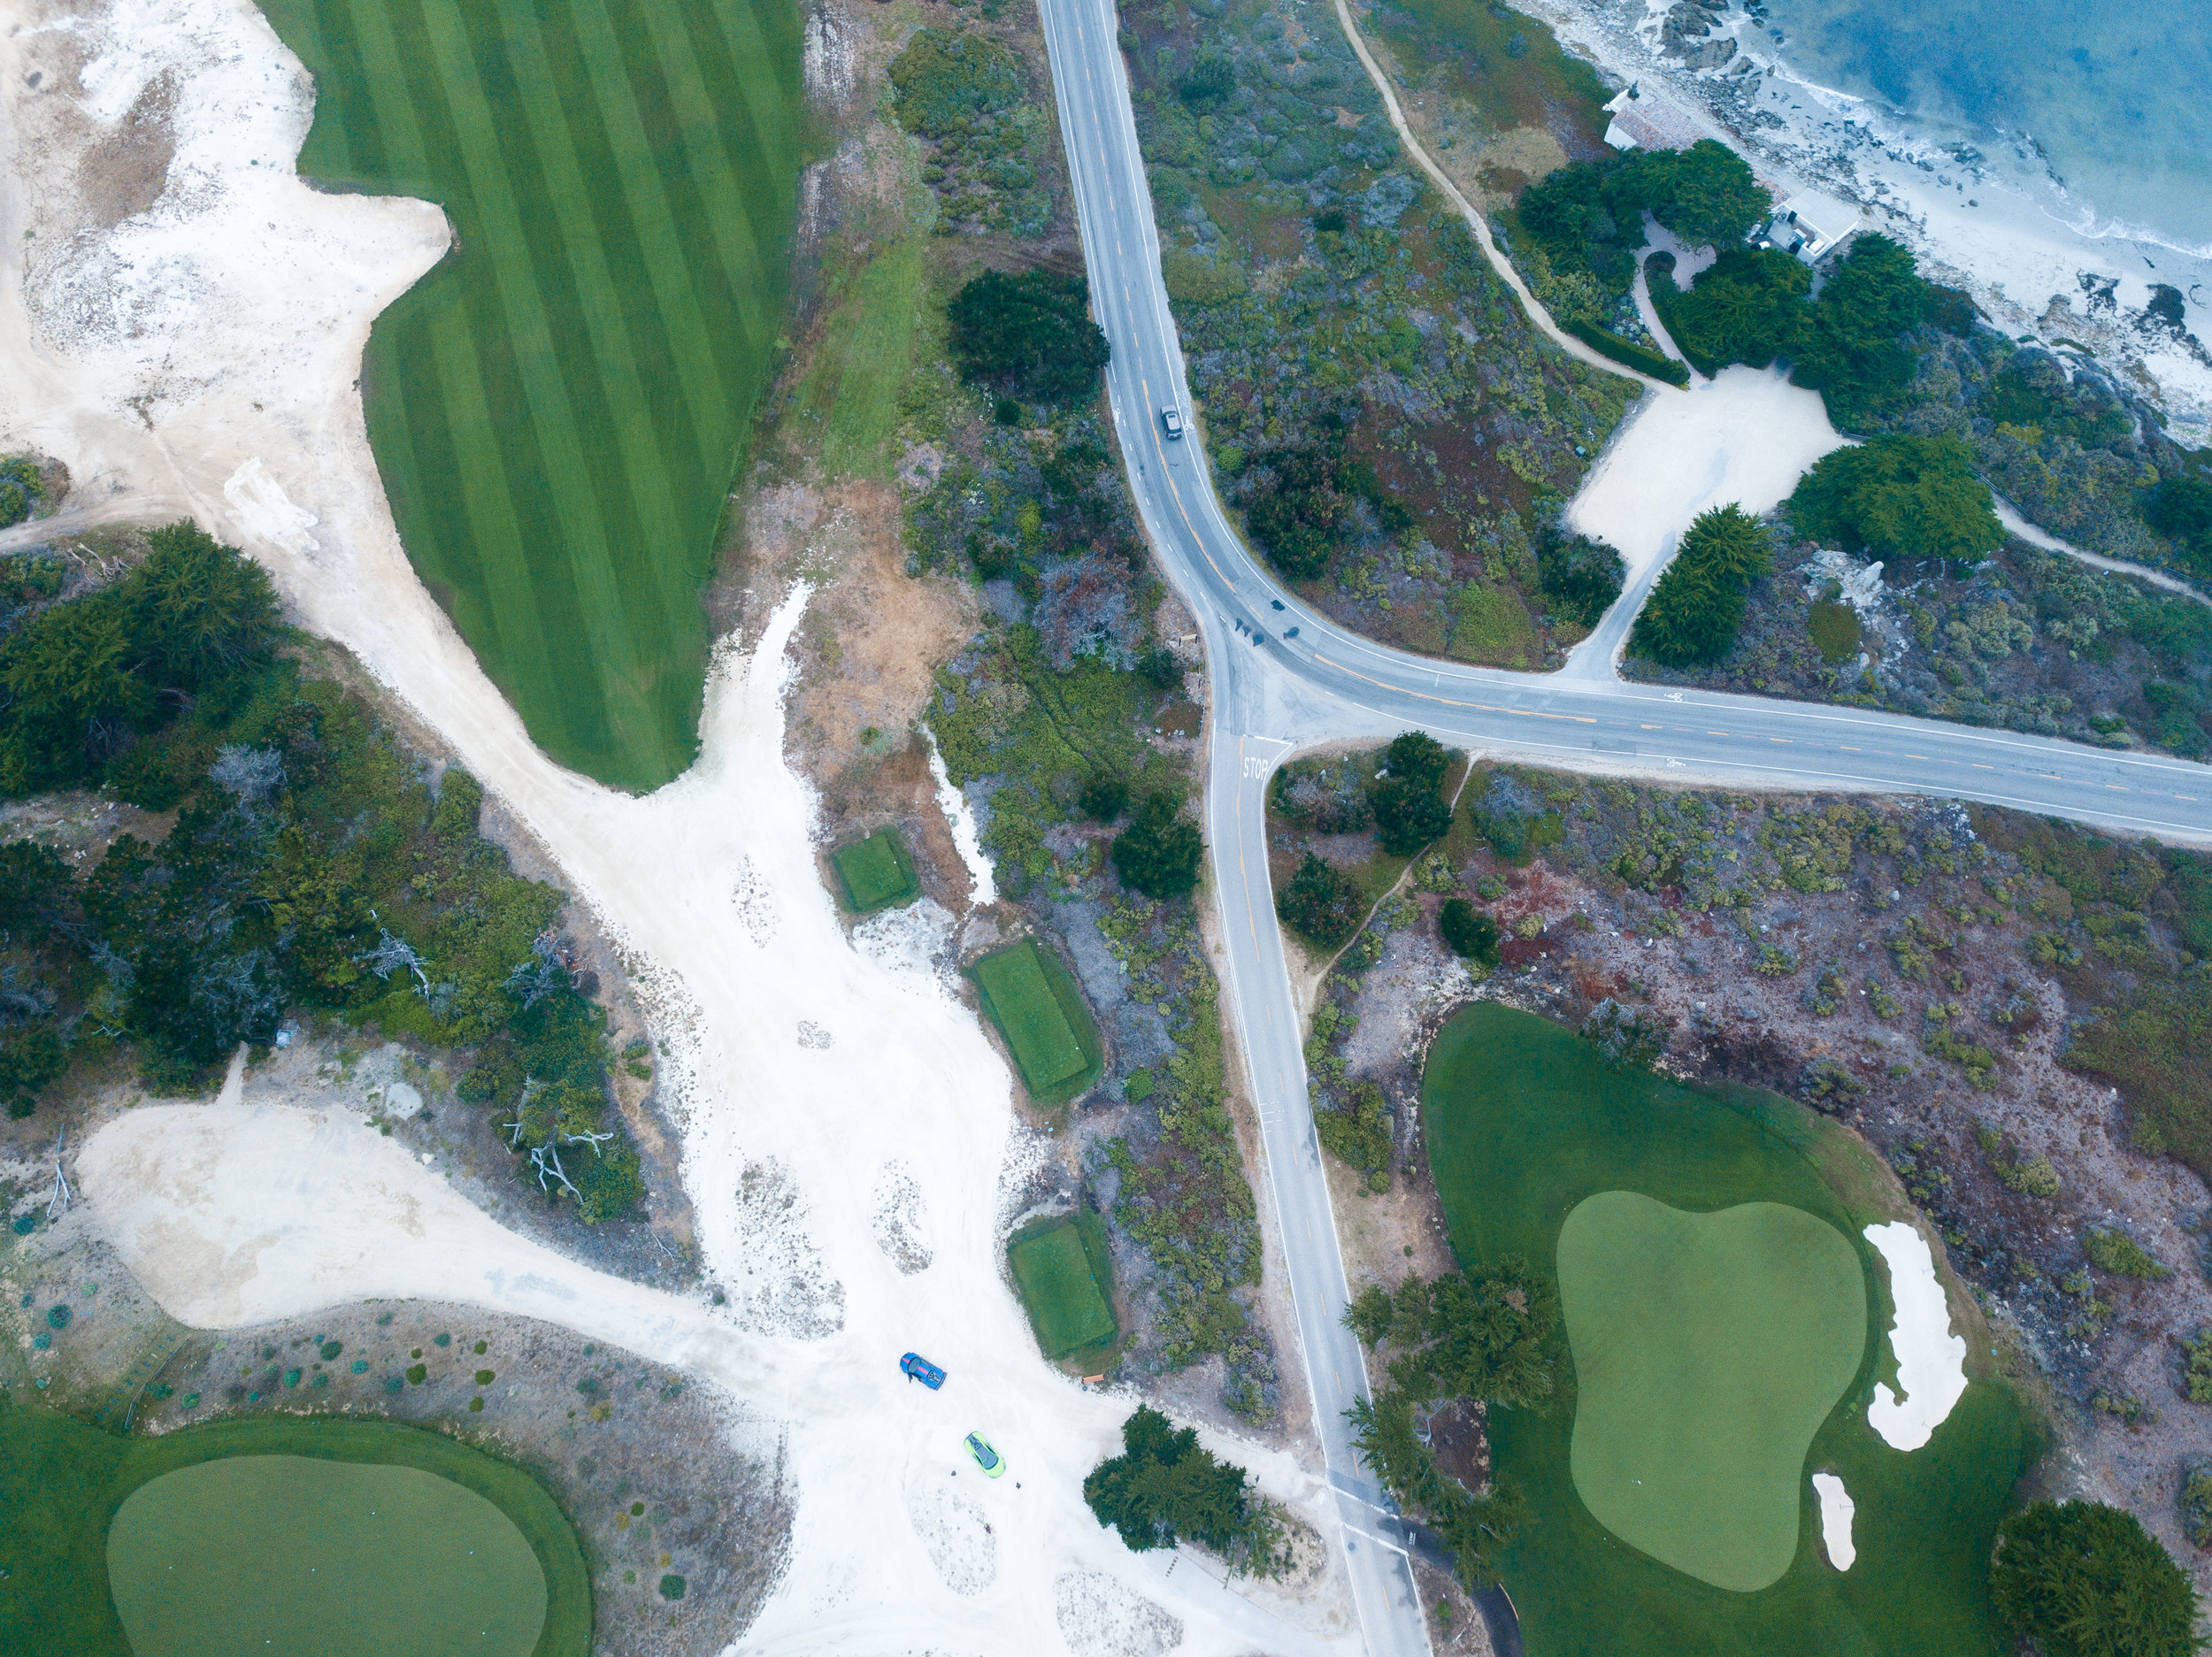 Stay_Driven_Monterey_Mclarens_DRONE-3.jpg